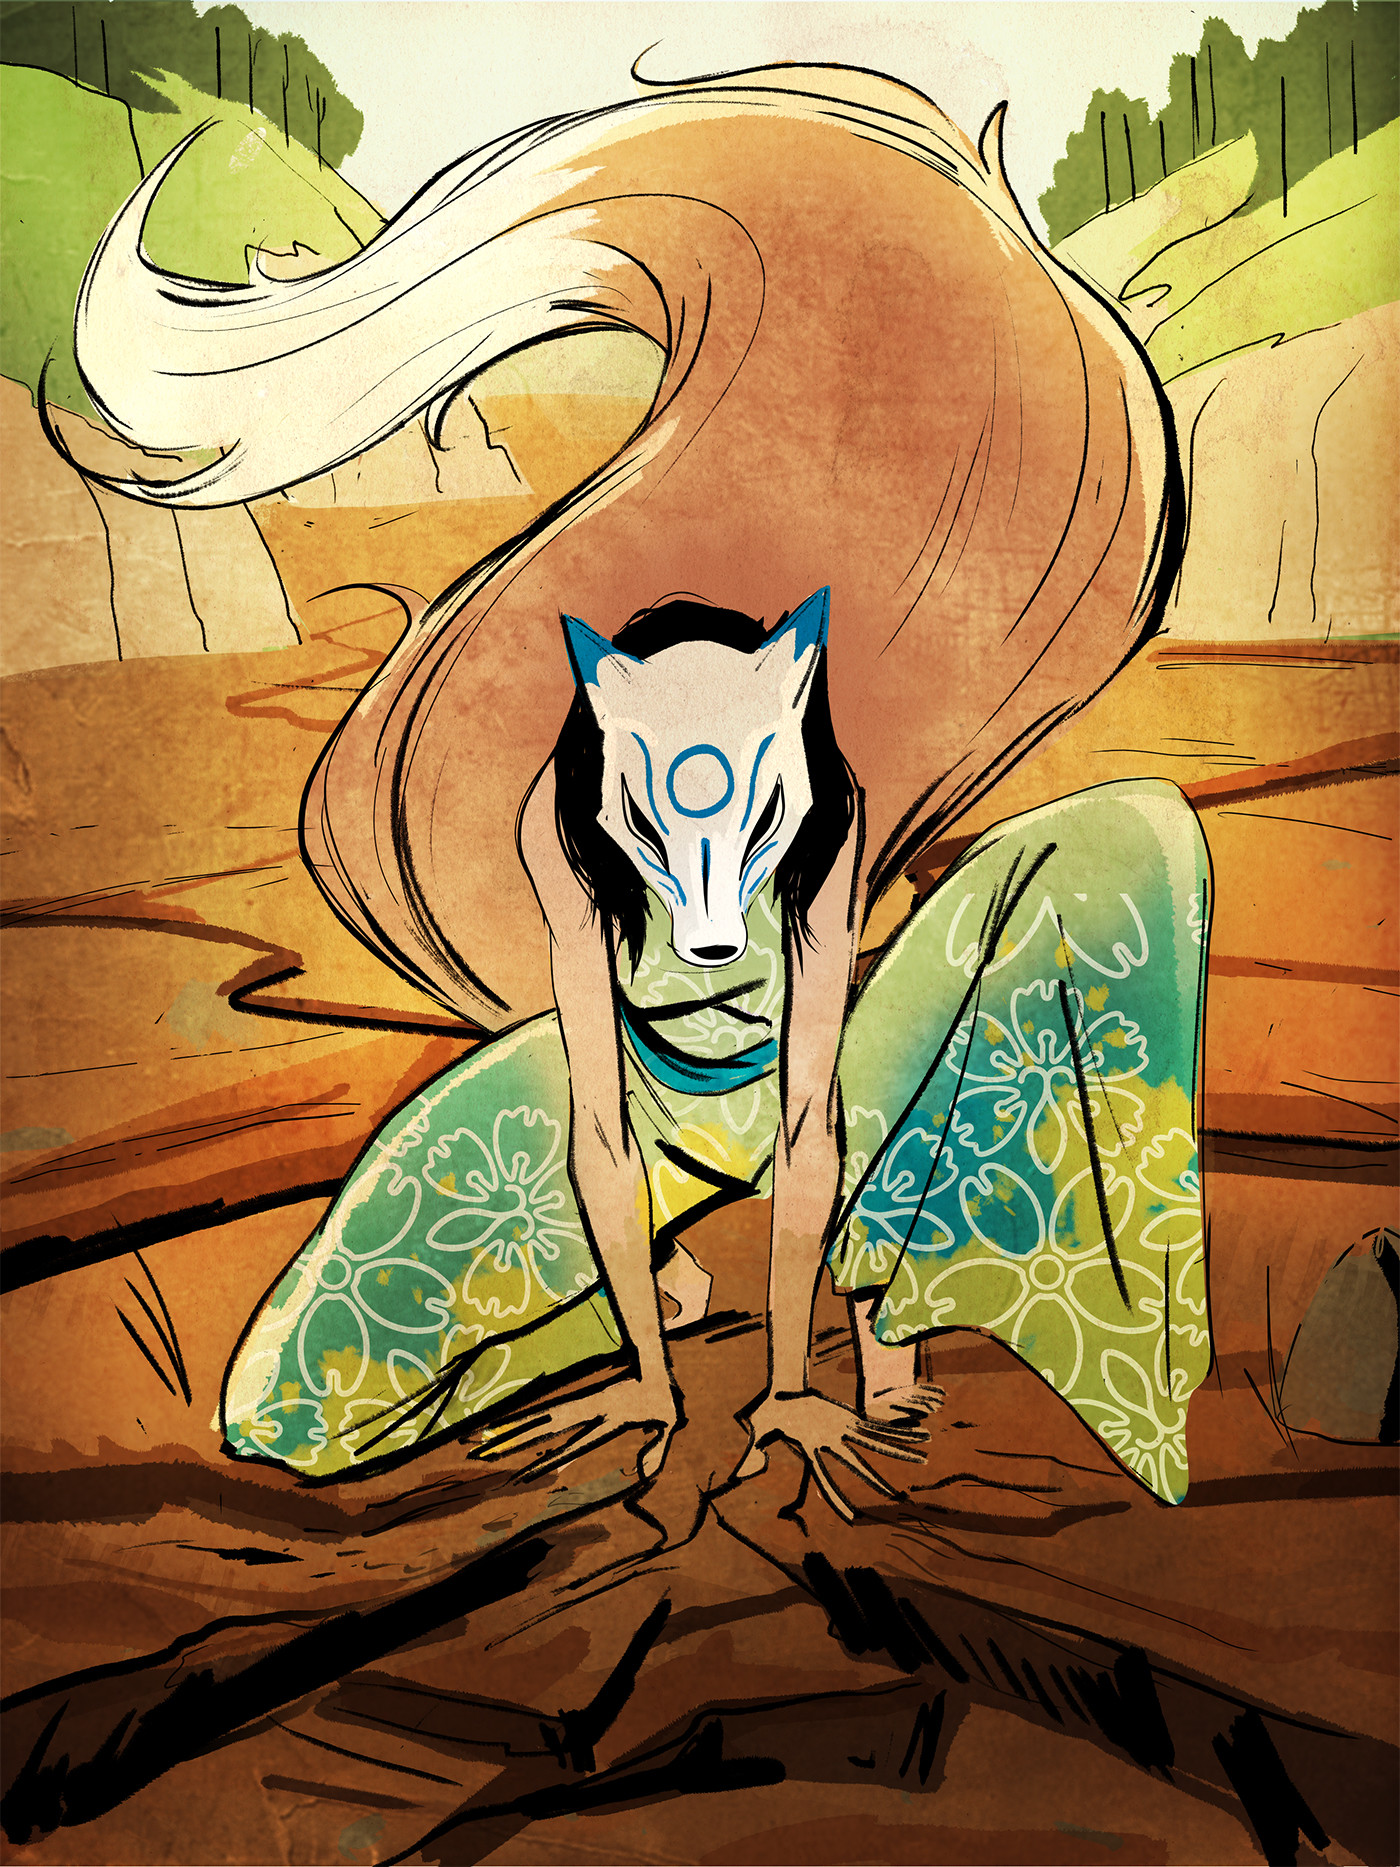 Lamaro smith jinja kitsune forest 0010 jinja kitsune earth